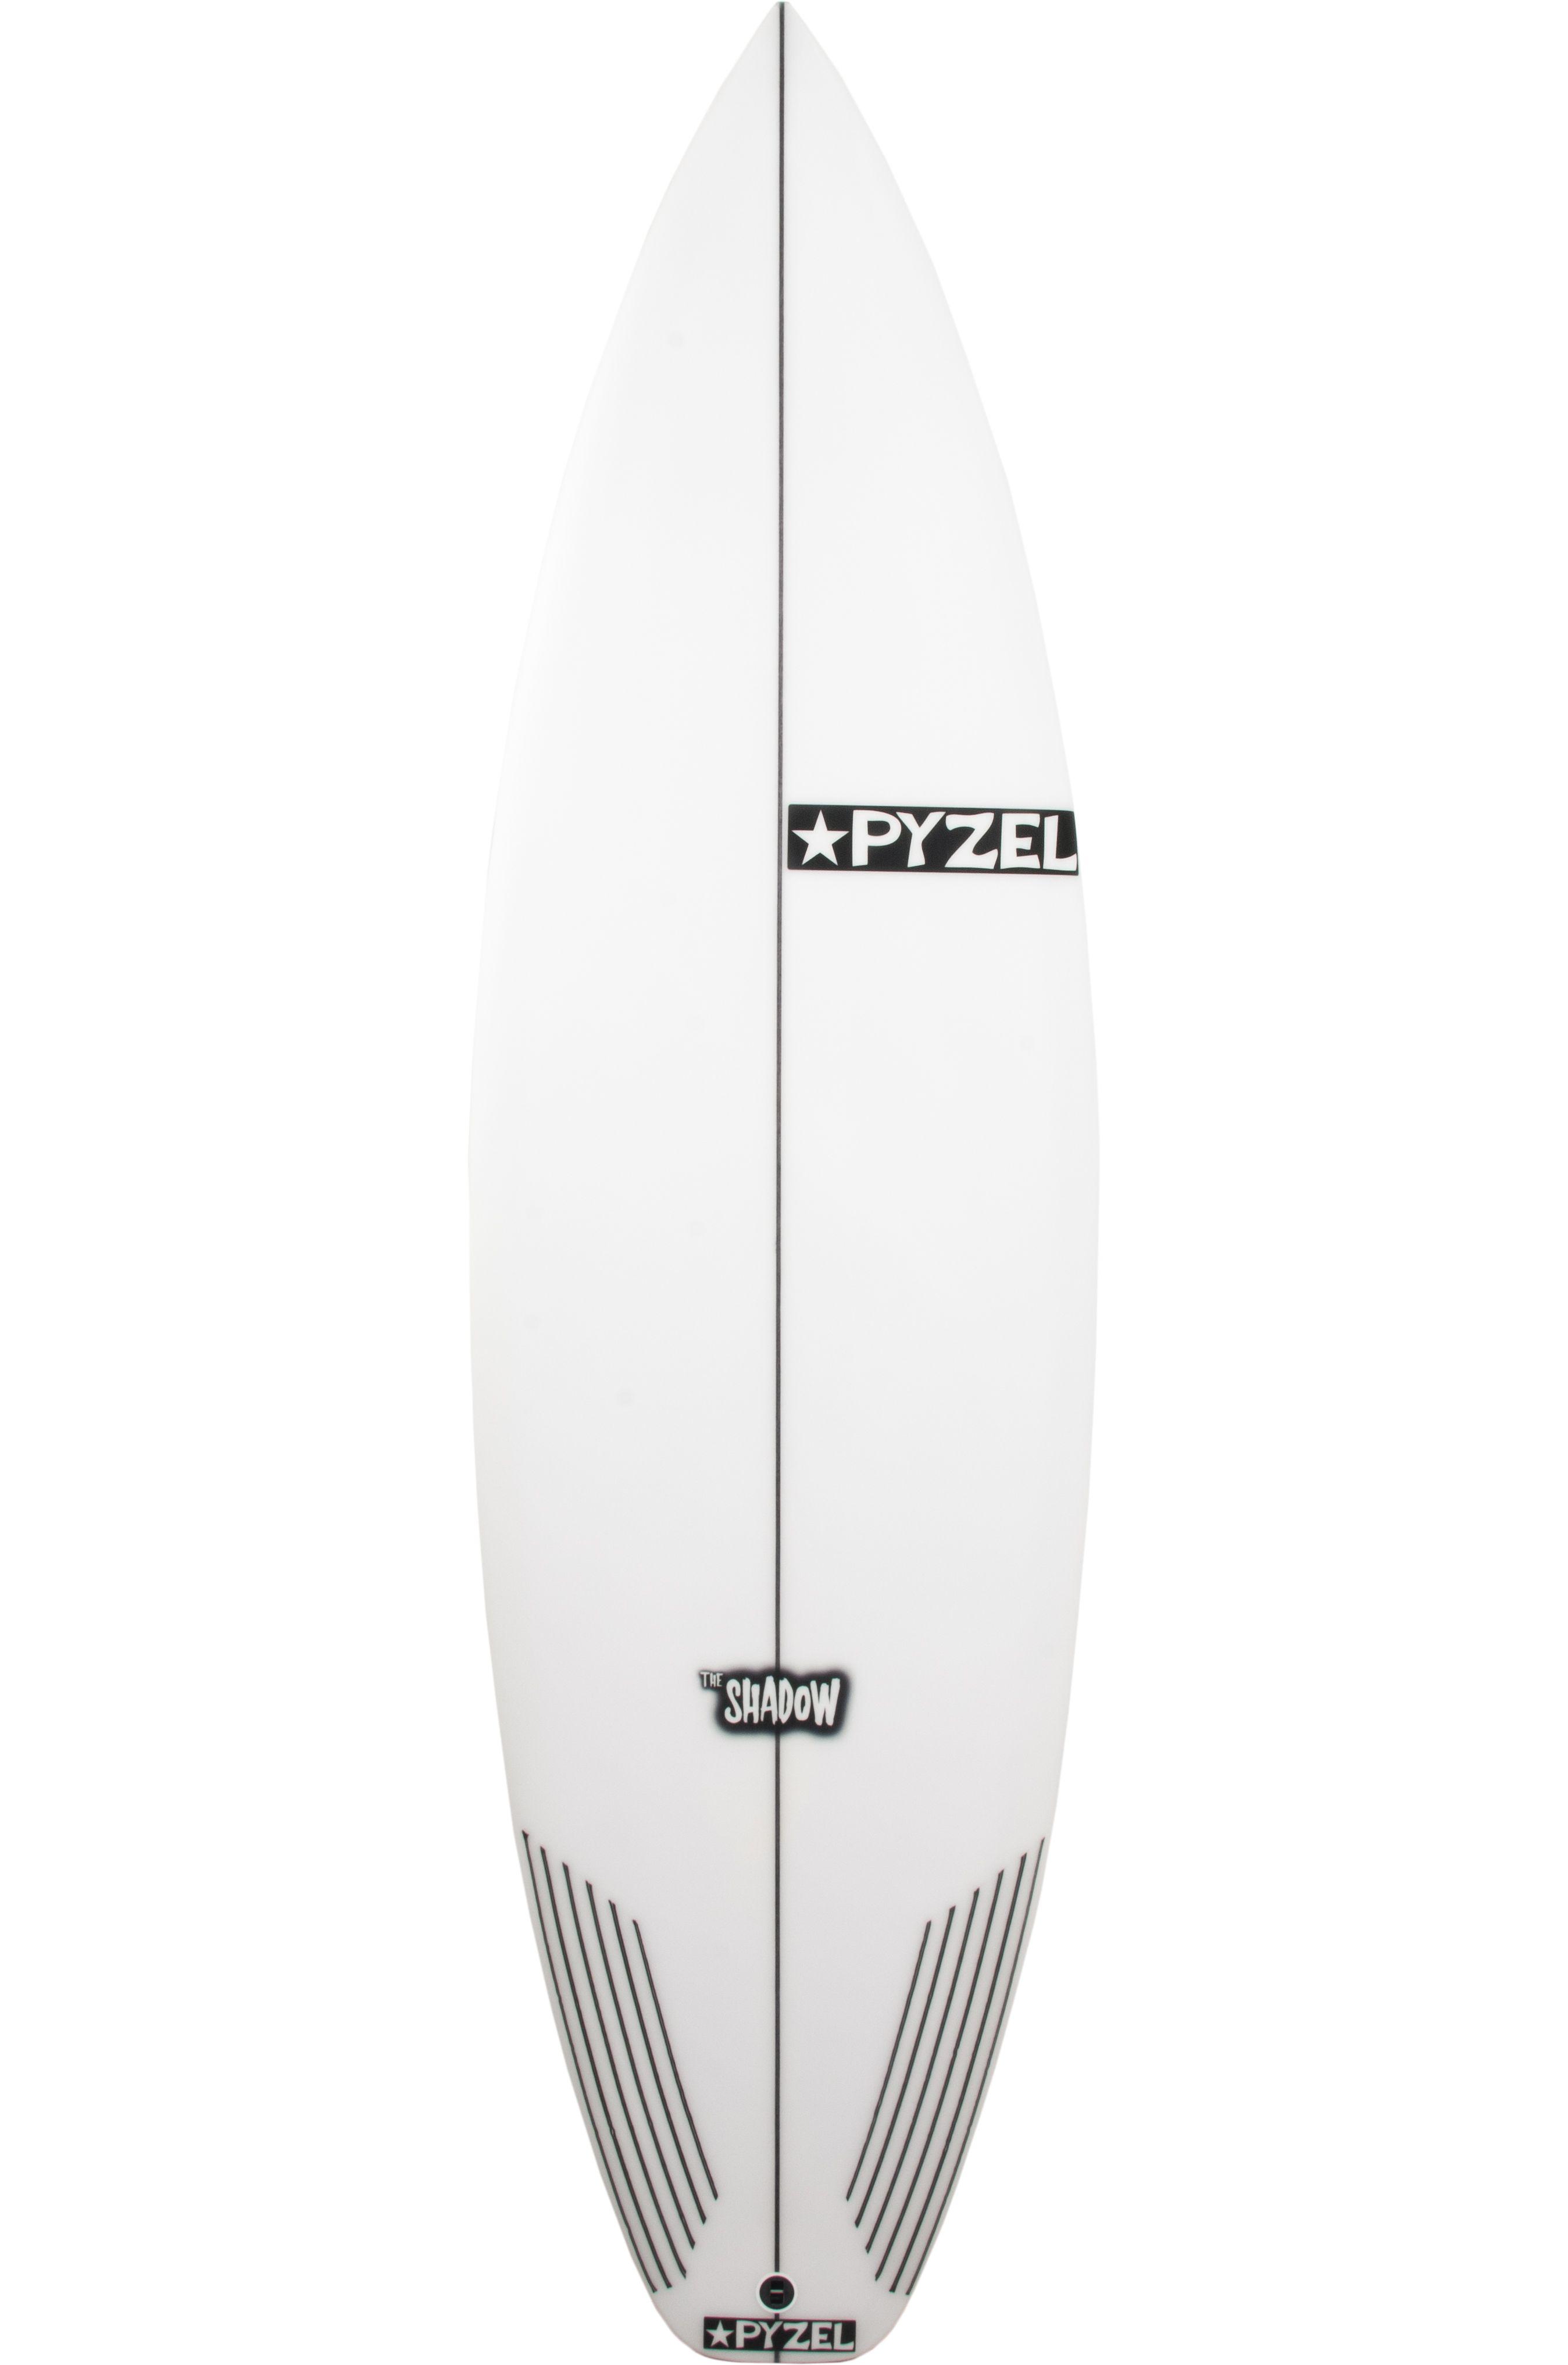 Prancha Surf Pyzel 5'8 SHADOW Squash Tail - White FCS II 5ft8